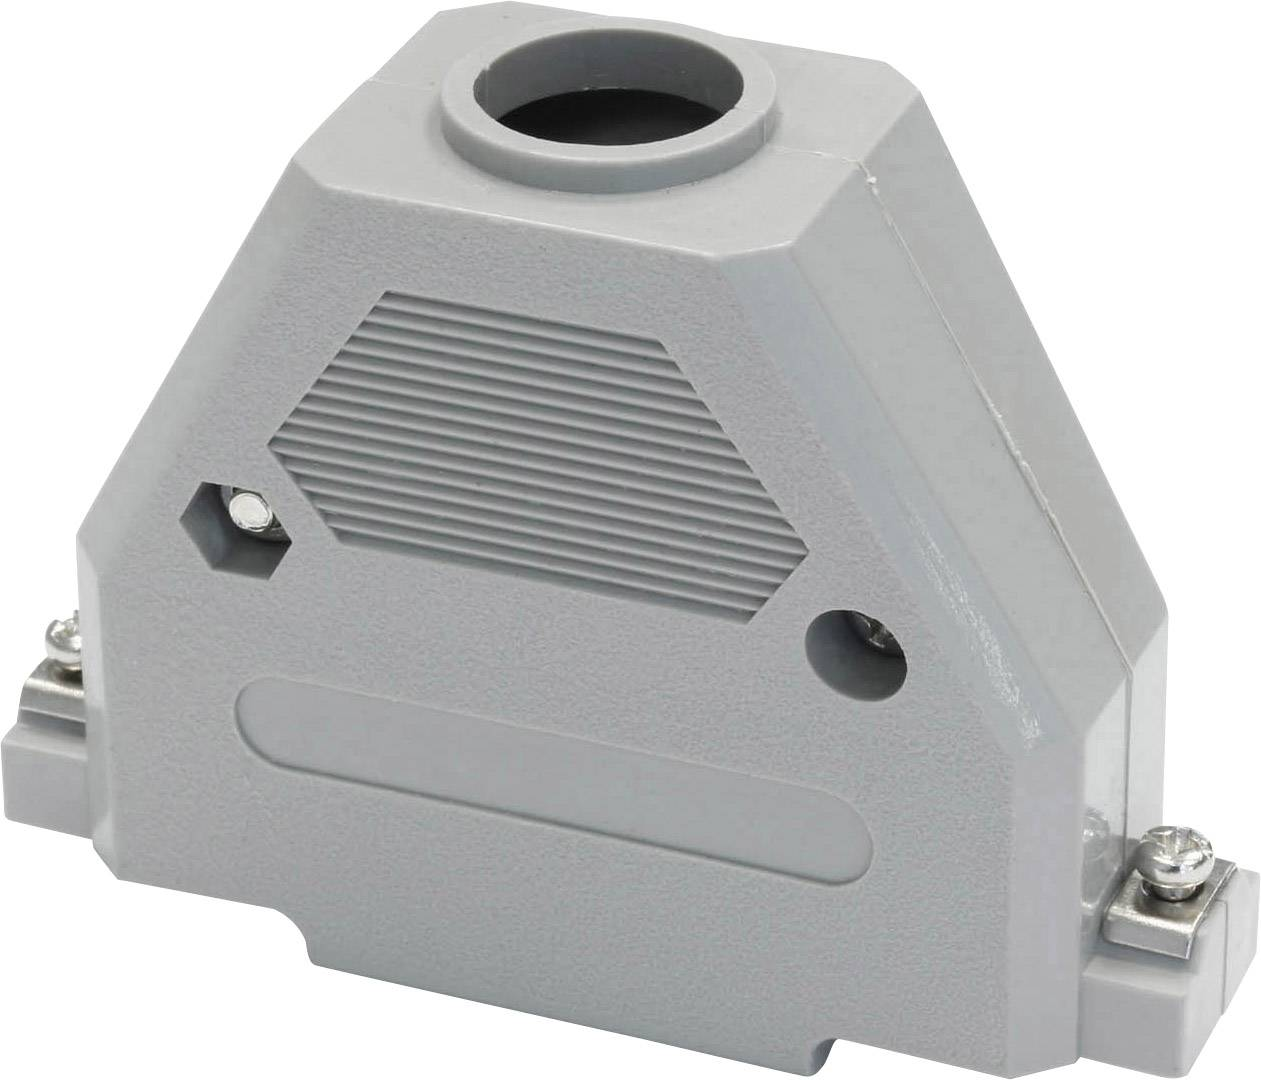 D-SUB pouzdro econ connect PH37, Pólů: 37, plast, 180 °, šedá, 1 ks